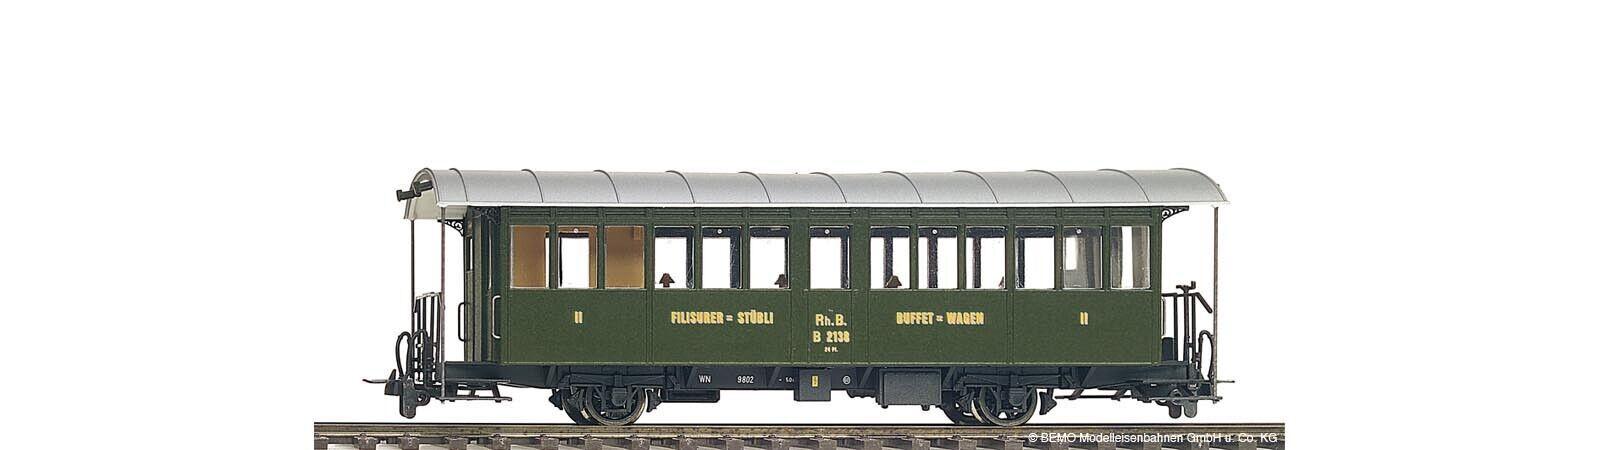 Bemo 3232148 histórico buffetwagen vagón restaurante B 2138 RHB h0m